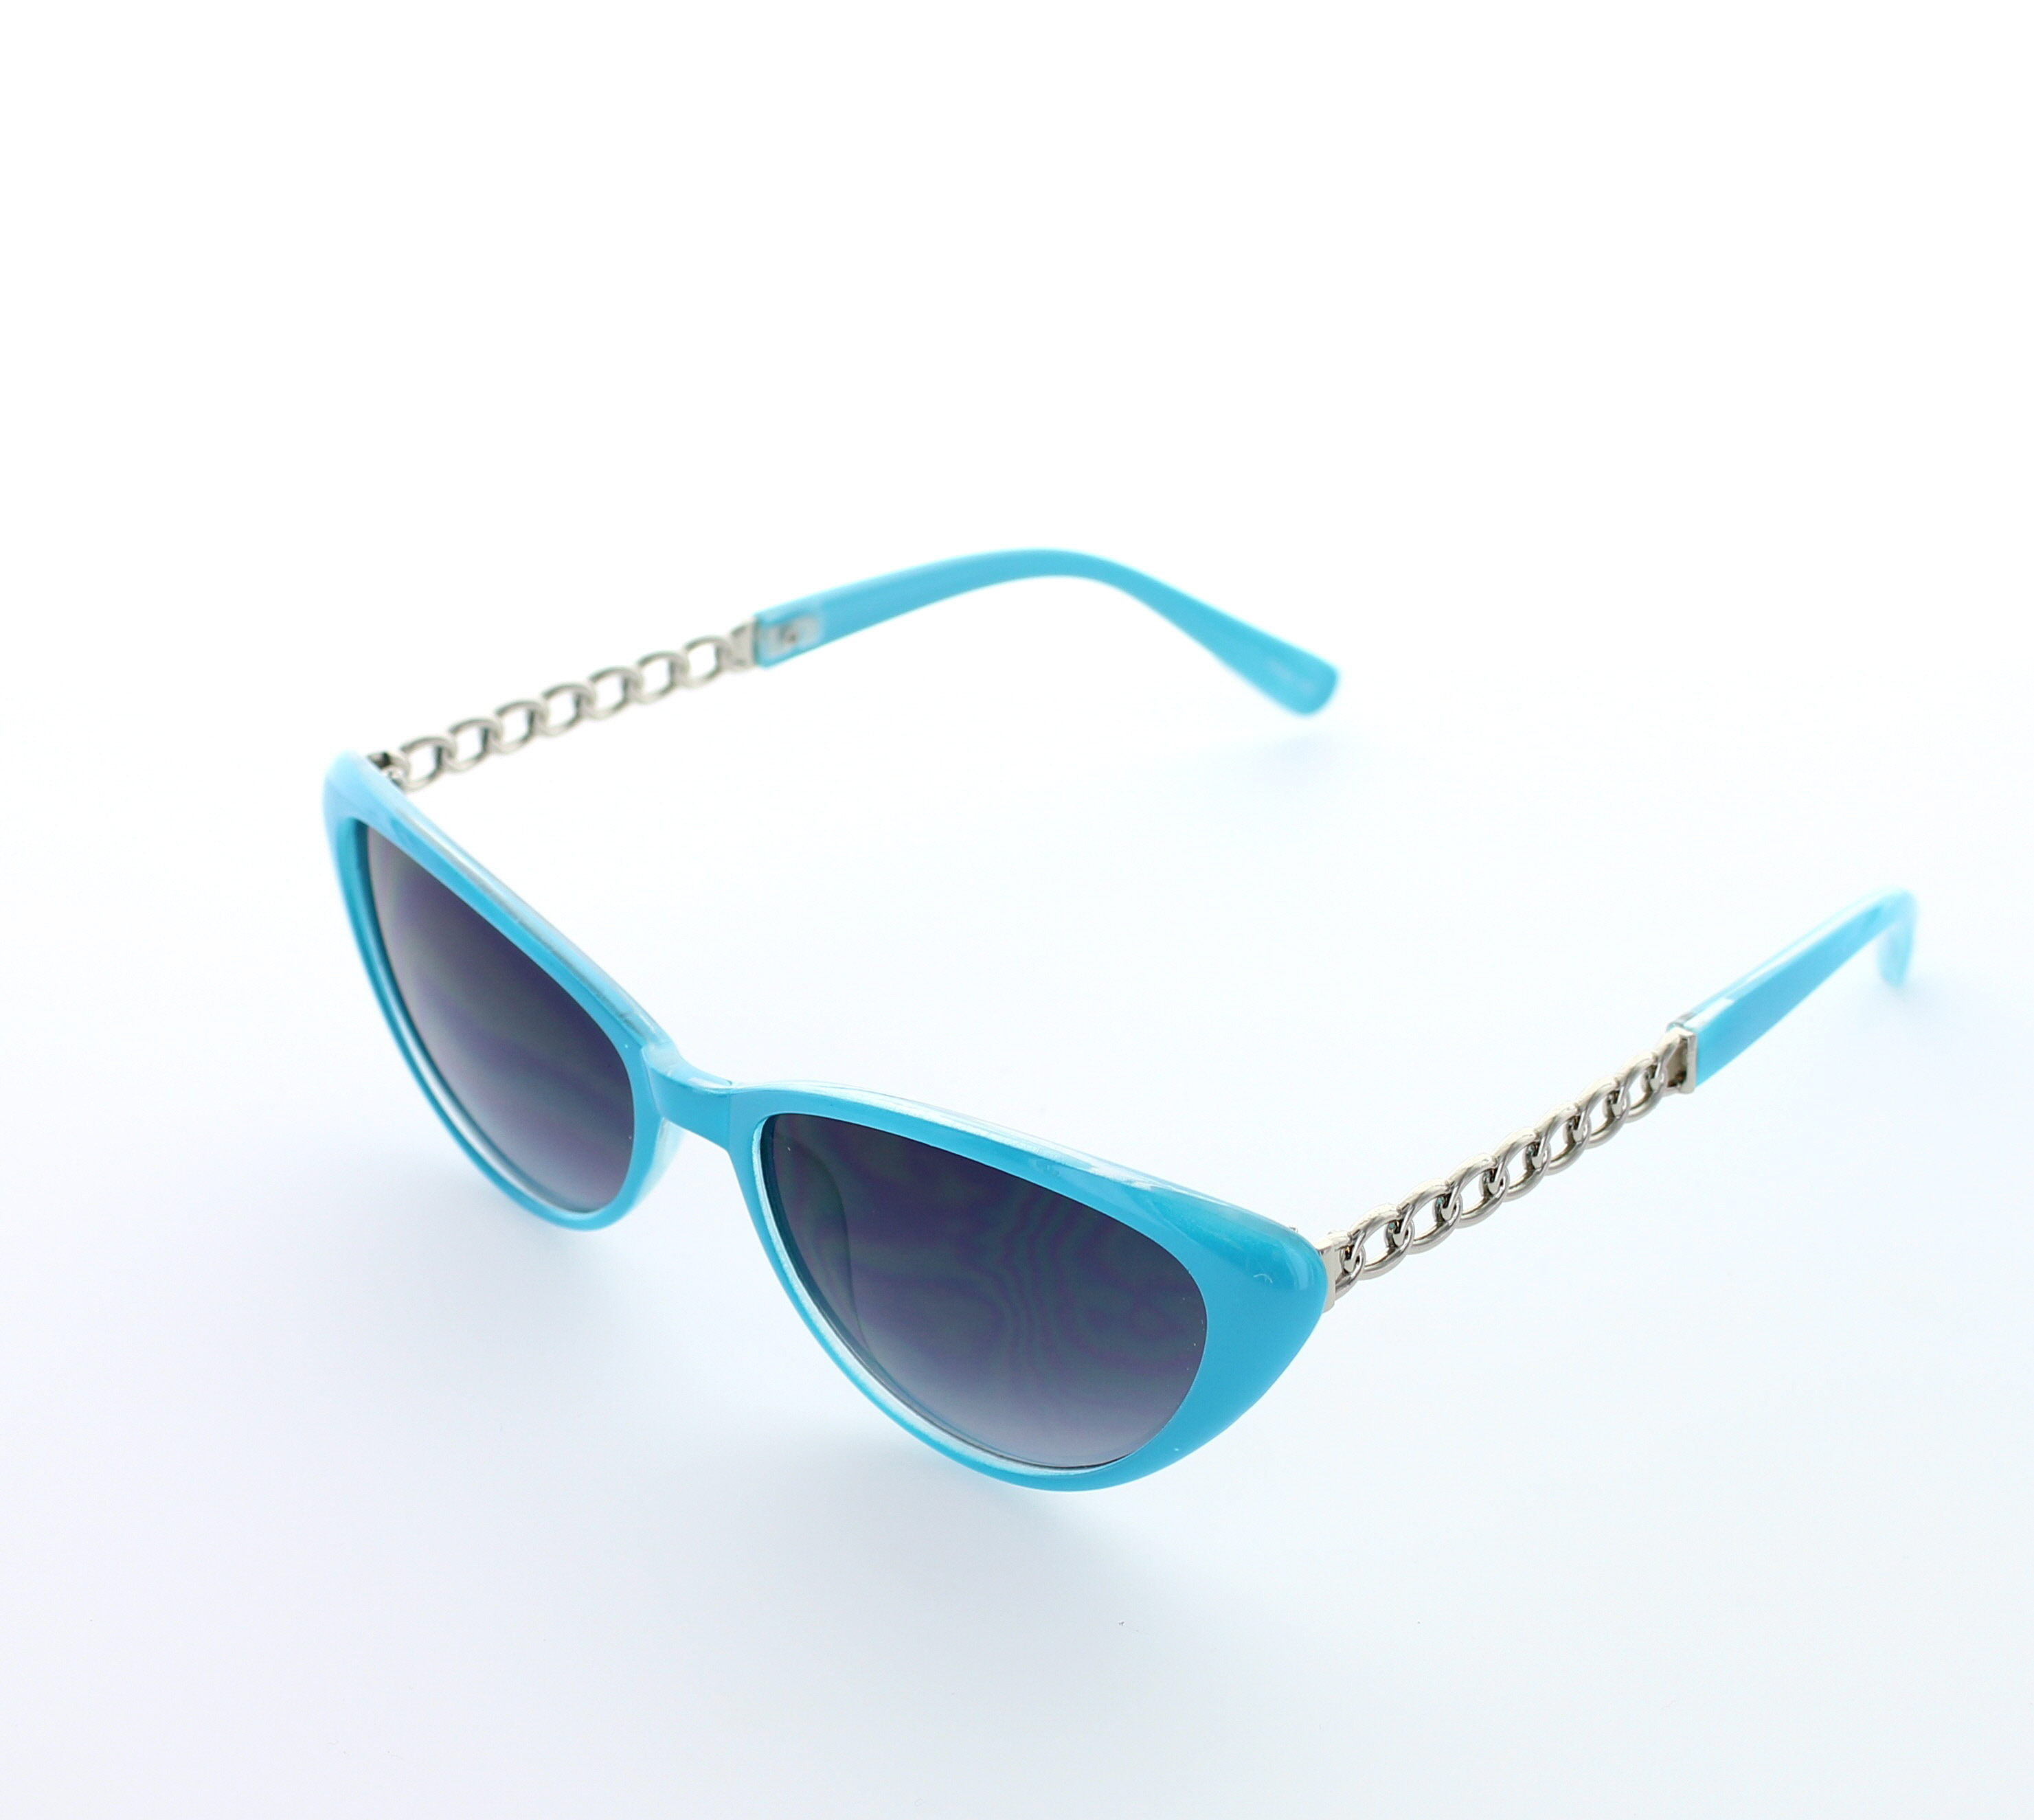 76f99d86d4 Online Sunglasses Shop « Heritage Malta